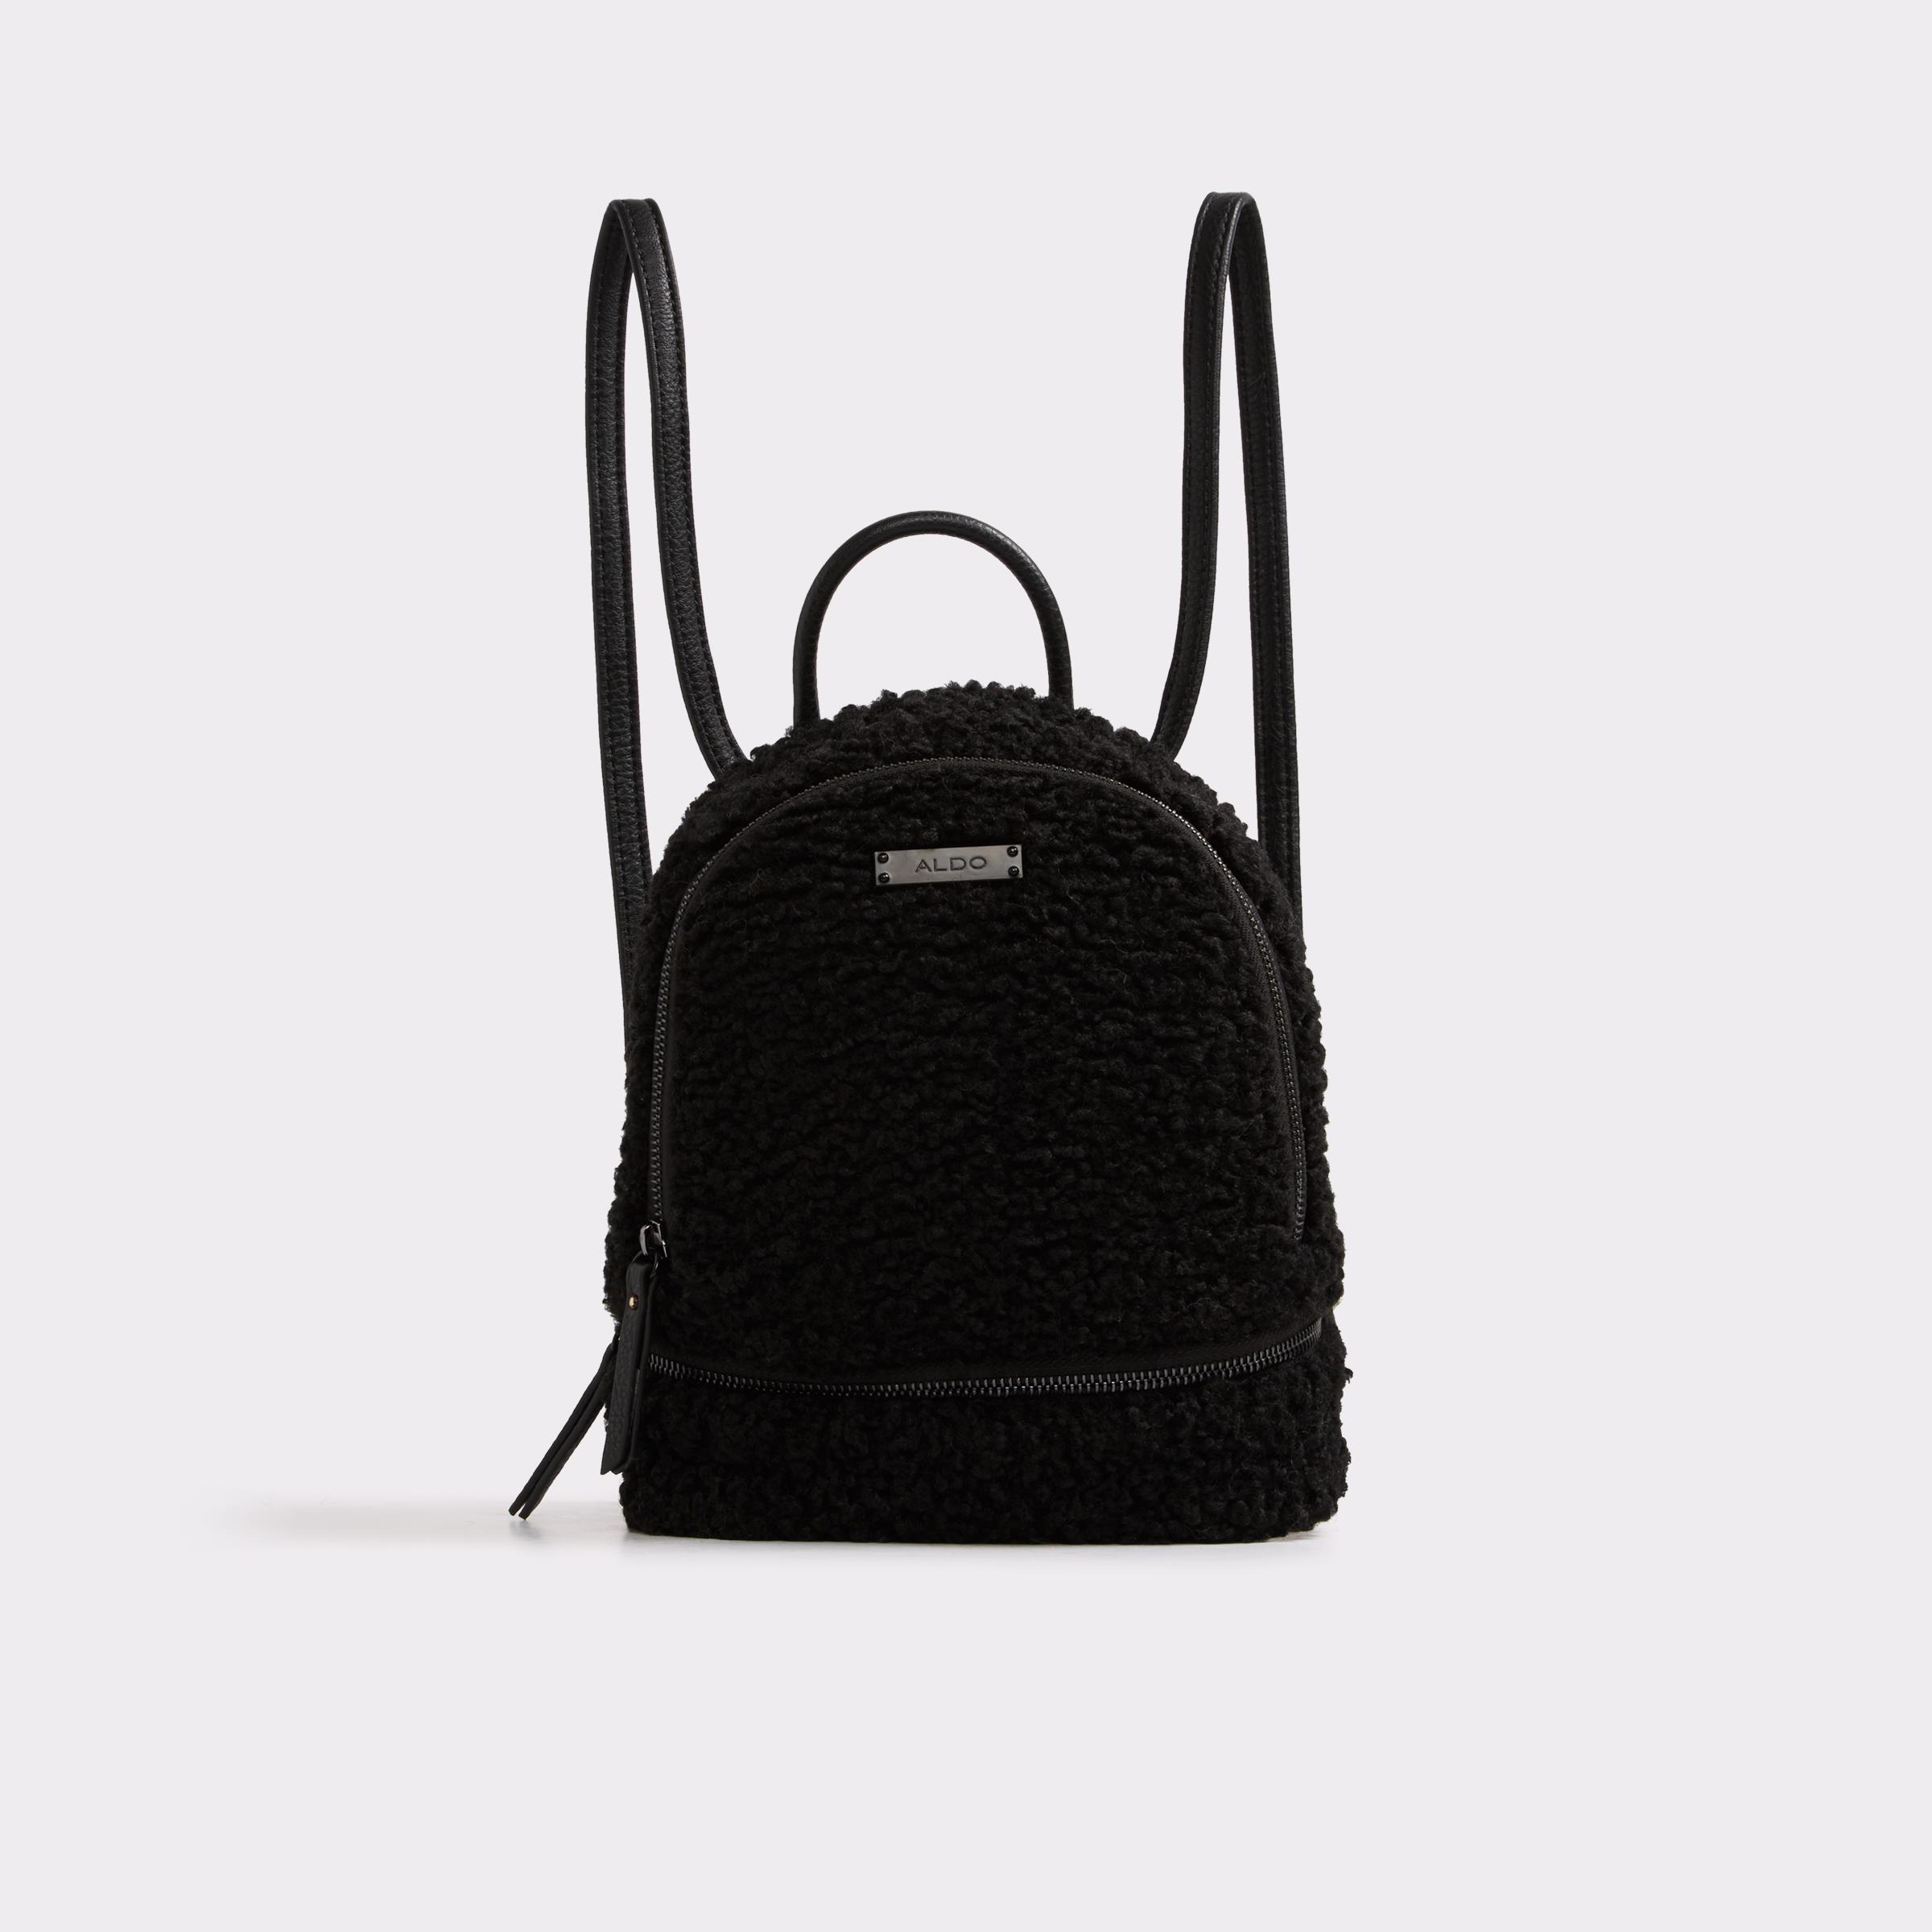 Rucsac negru, de dama, ALDO - Anaco98, din material textil